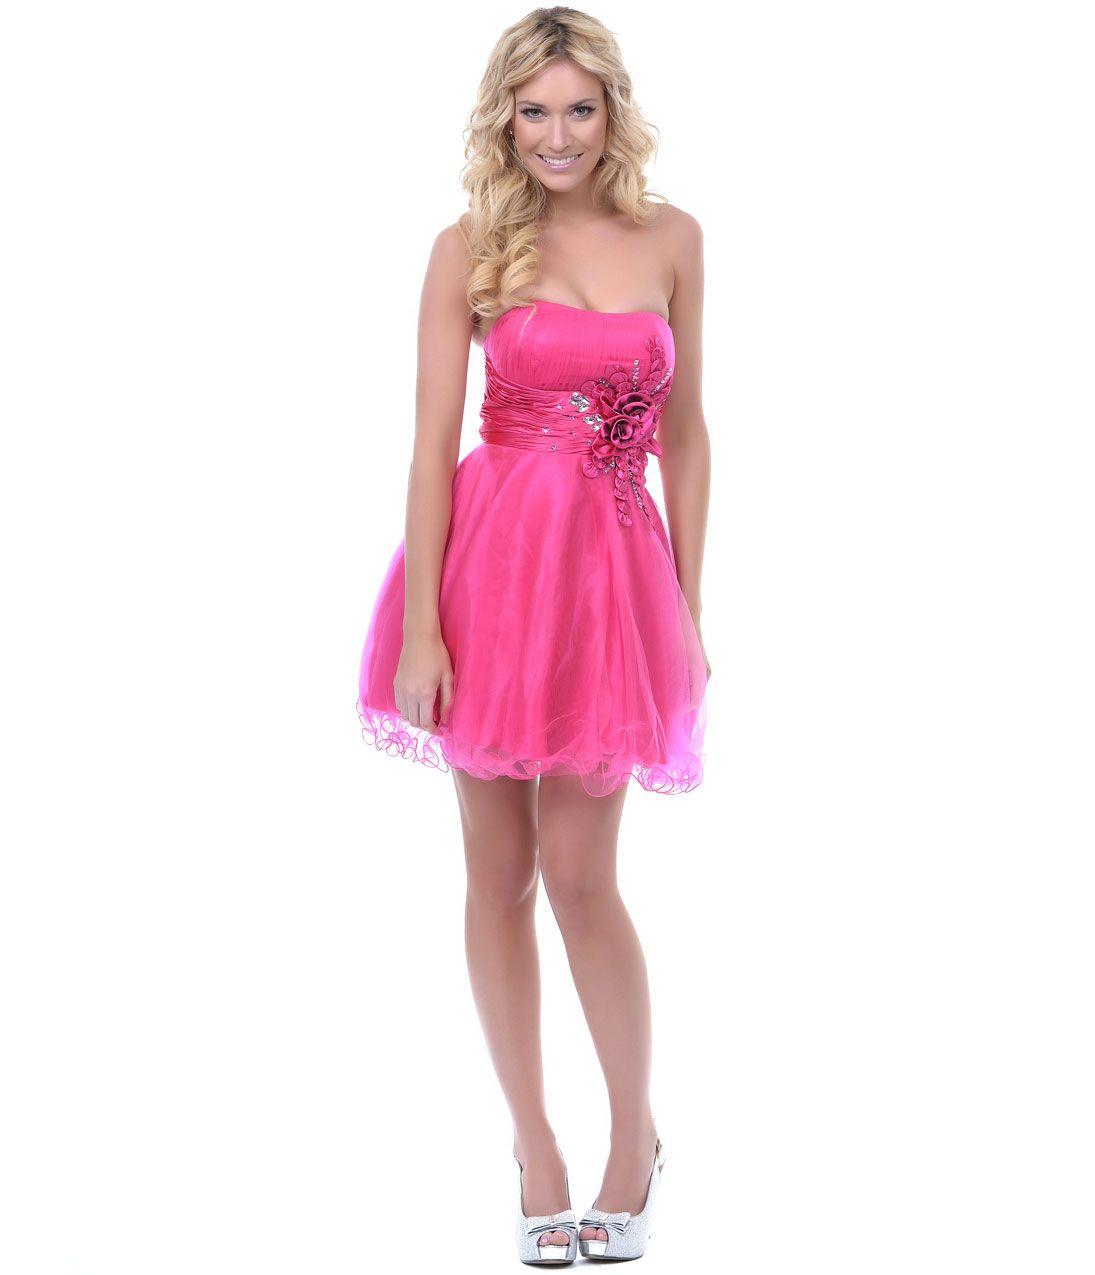 Fuchsia Tulle & Satin Empire Waist Short Prom Dress - Unique Vintage ...